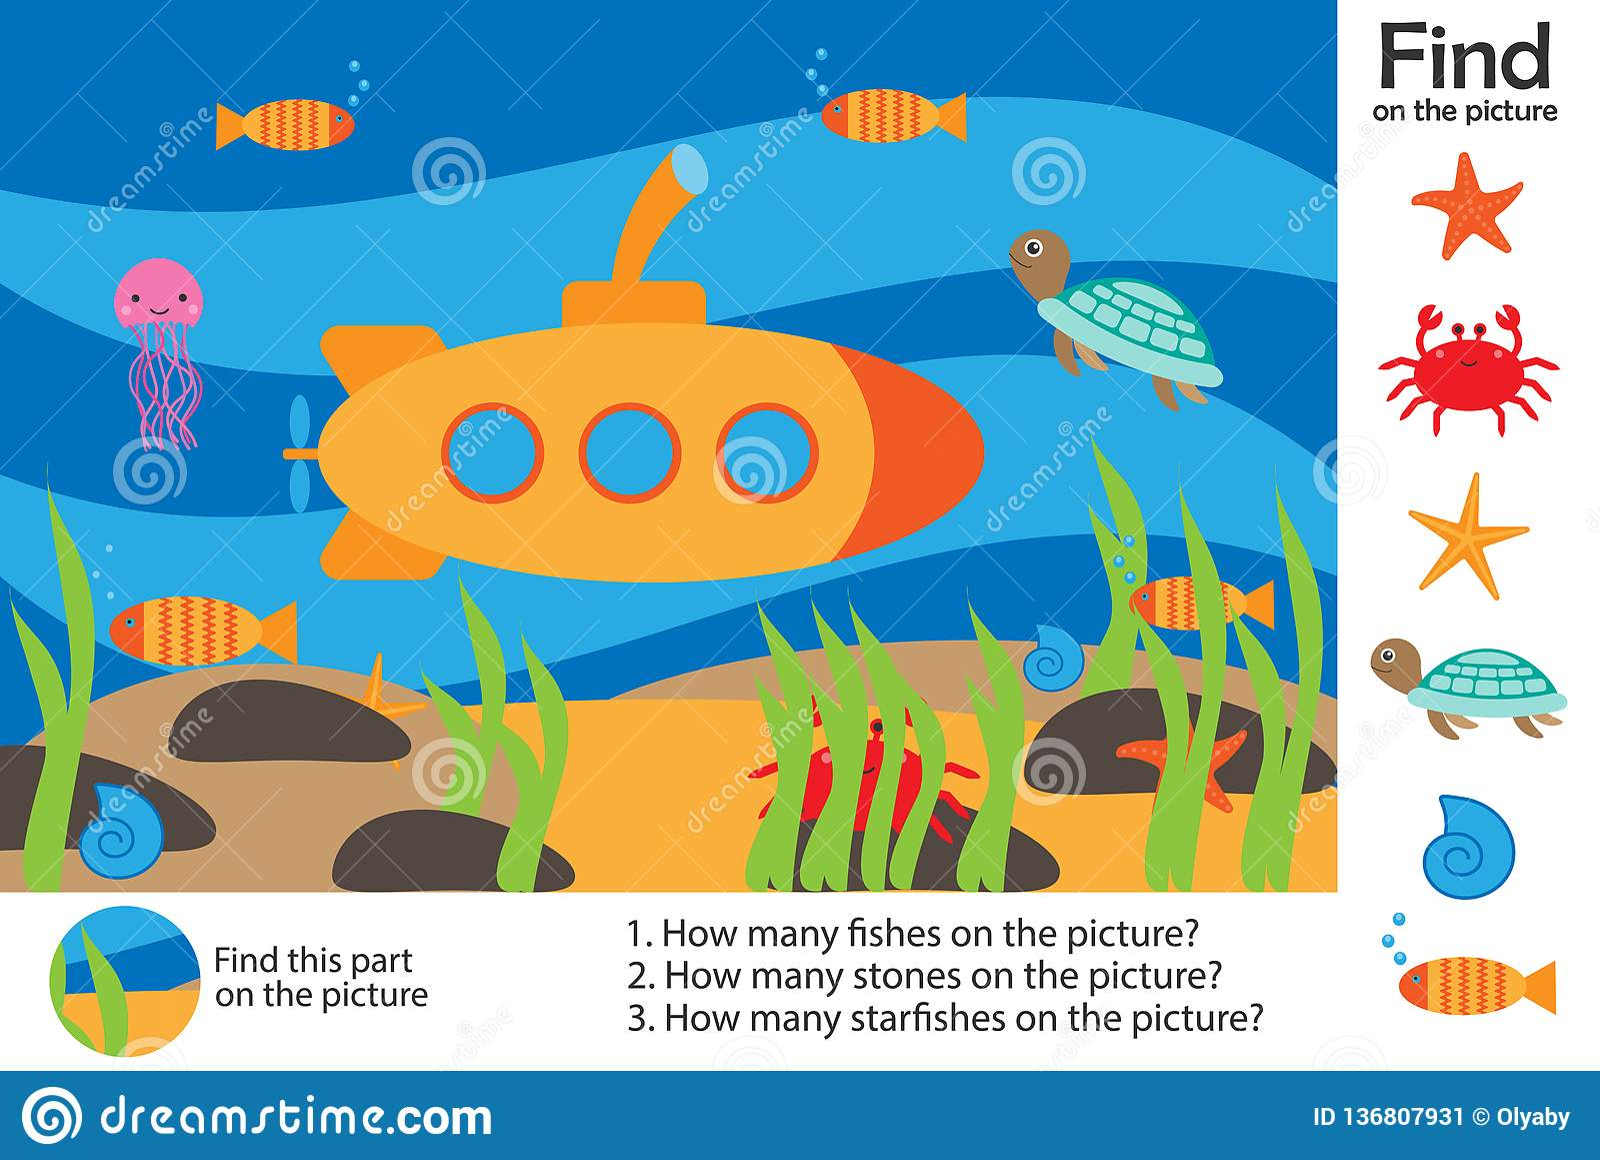 Activity Page Sea World Underwater In Cartoon Style Find